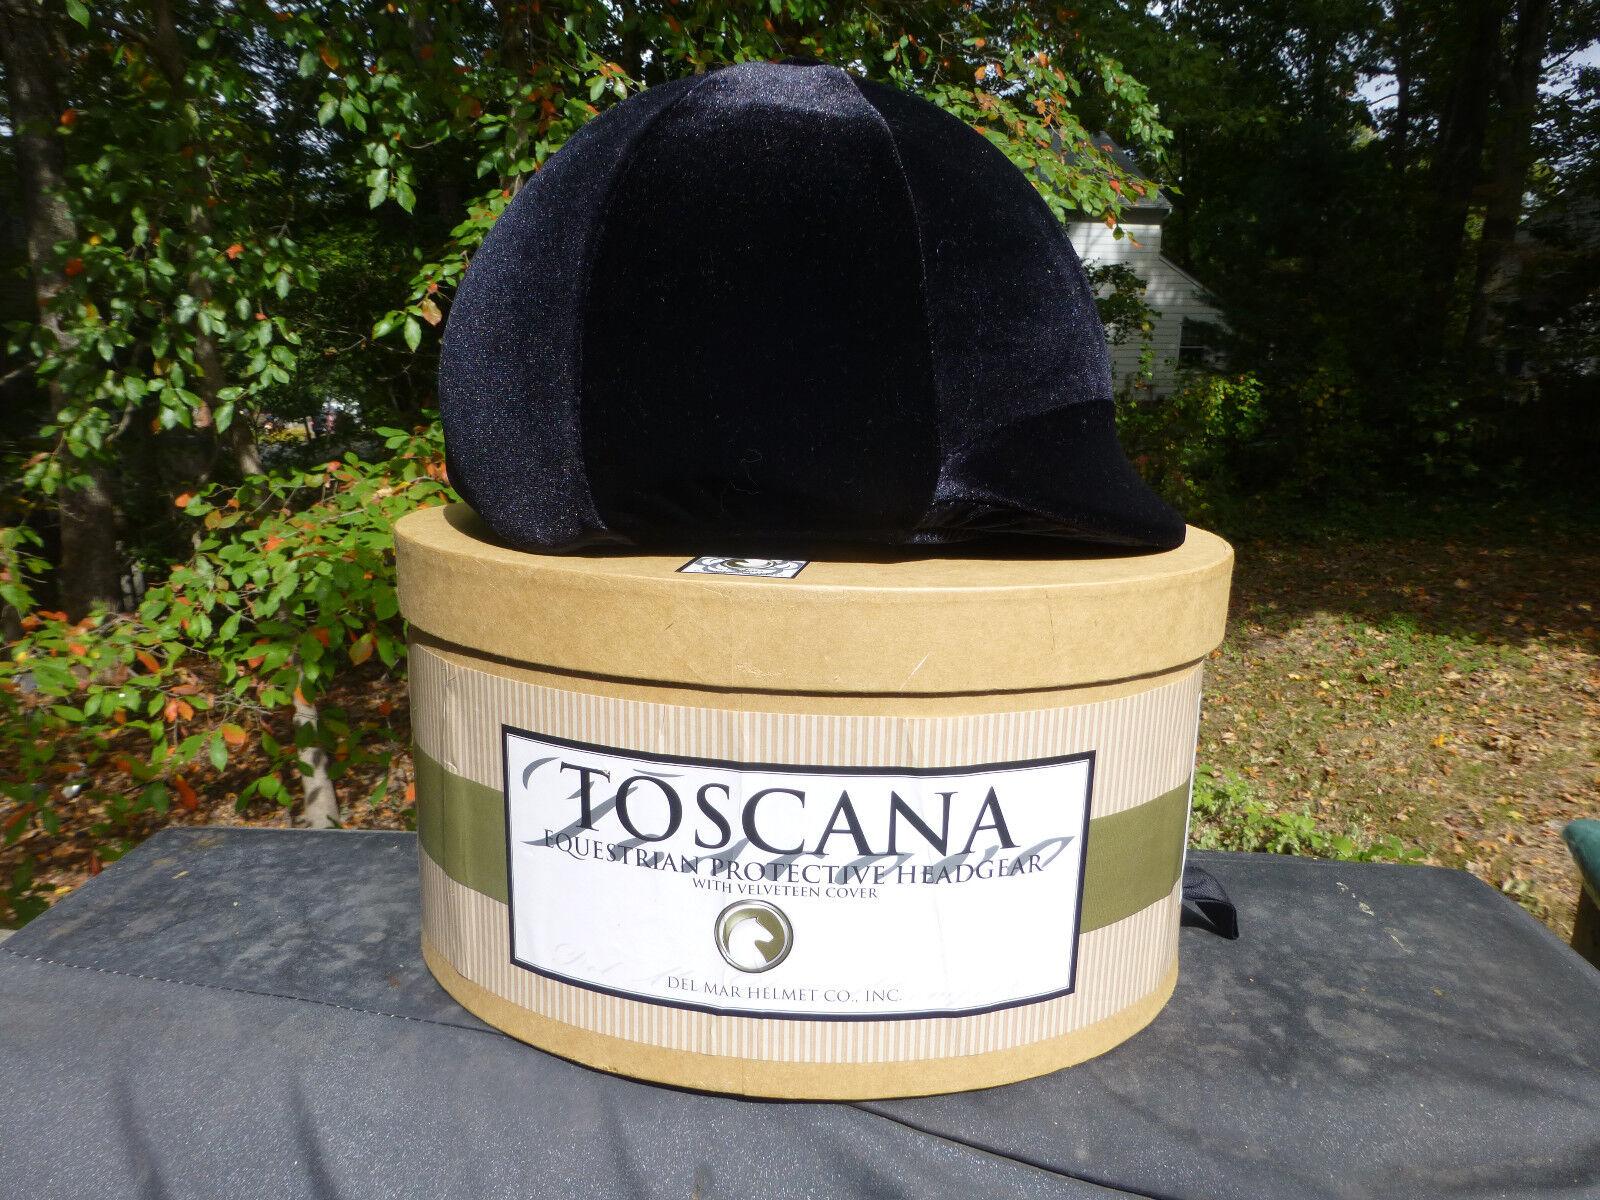 NEW Toscana Equestrian Helmet Predective Headgear Medium Hat Size 7 to 7 1 8